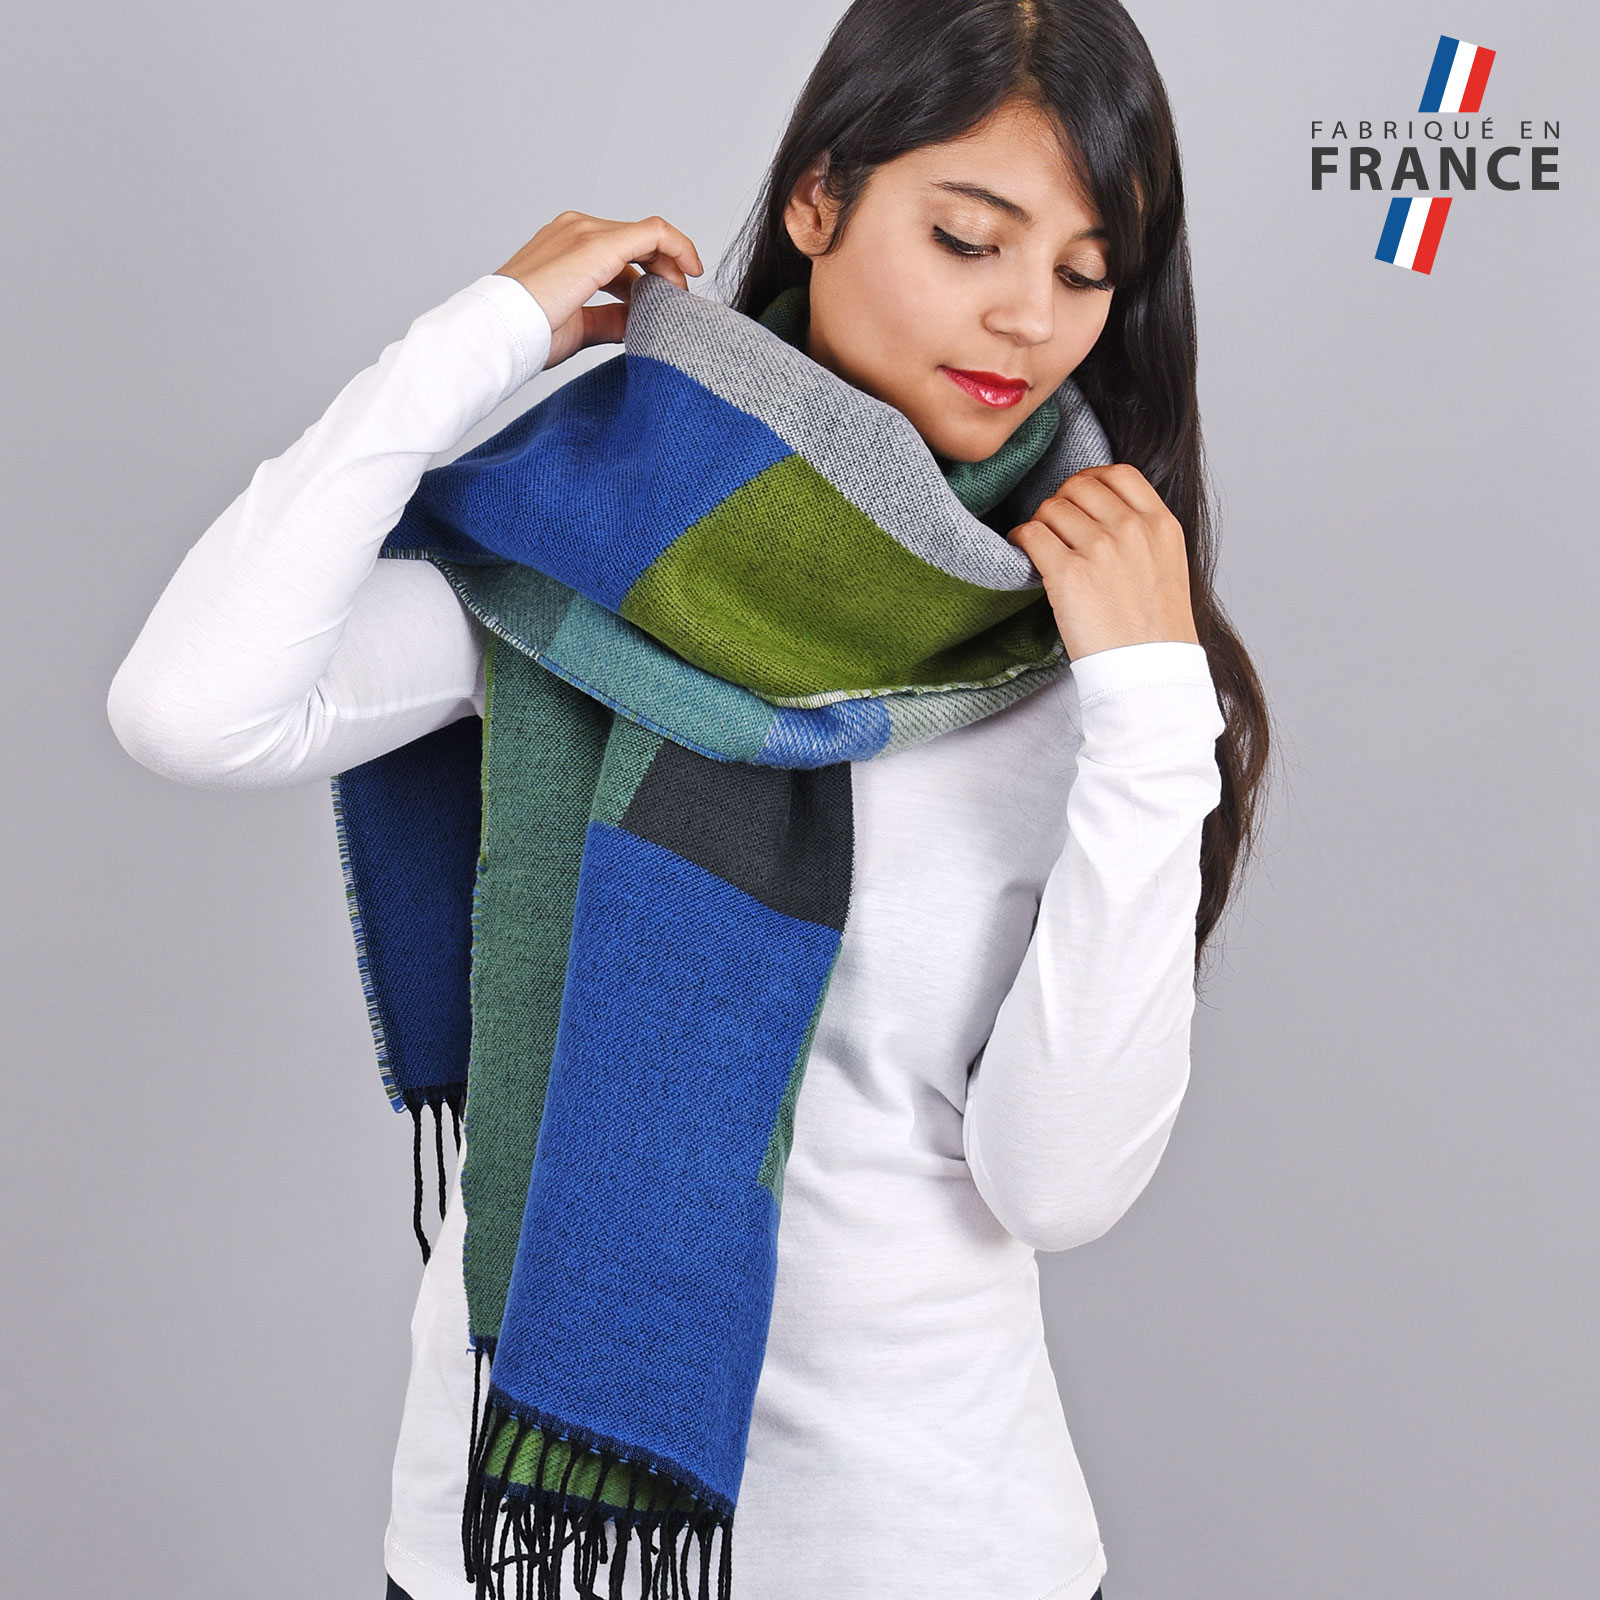 AT-03755-VF16-1-LB_FR-chale-hiver-patchwork-kaki